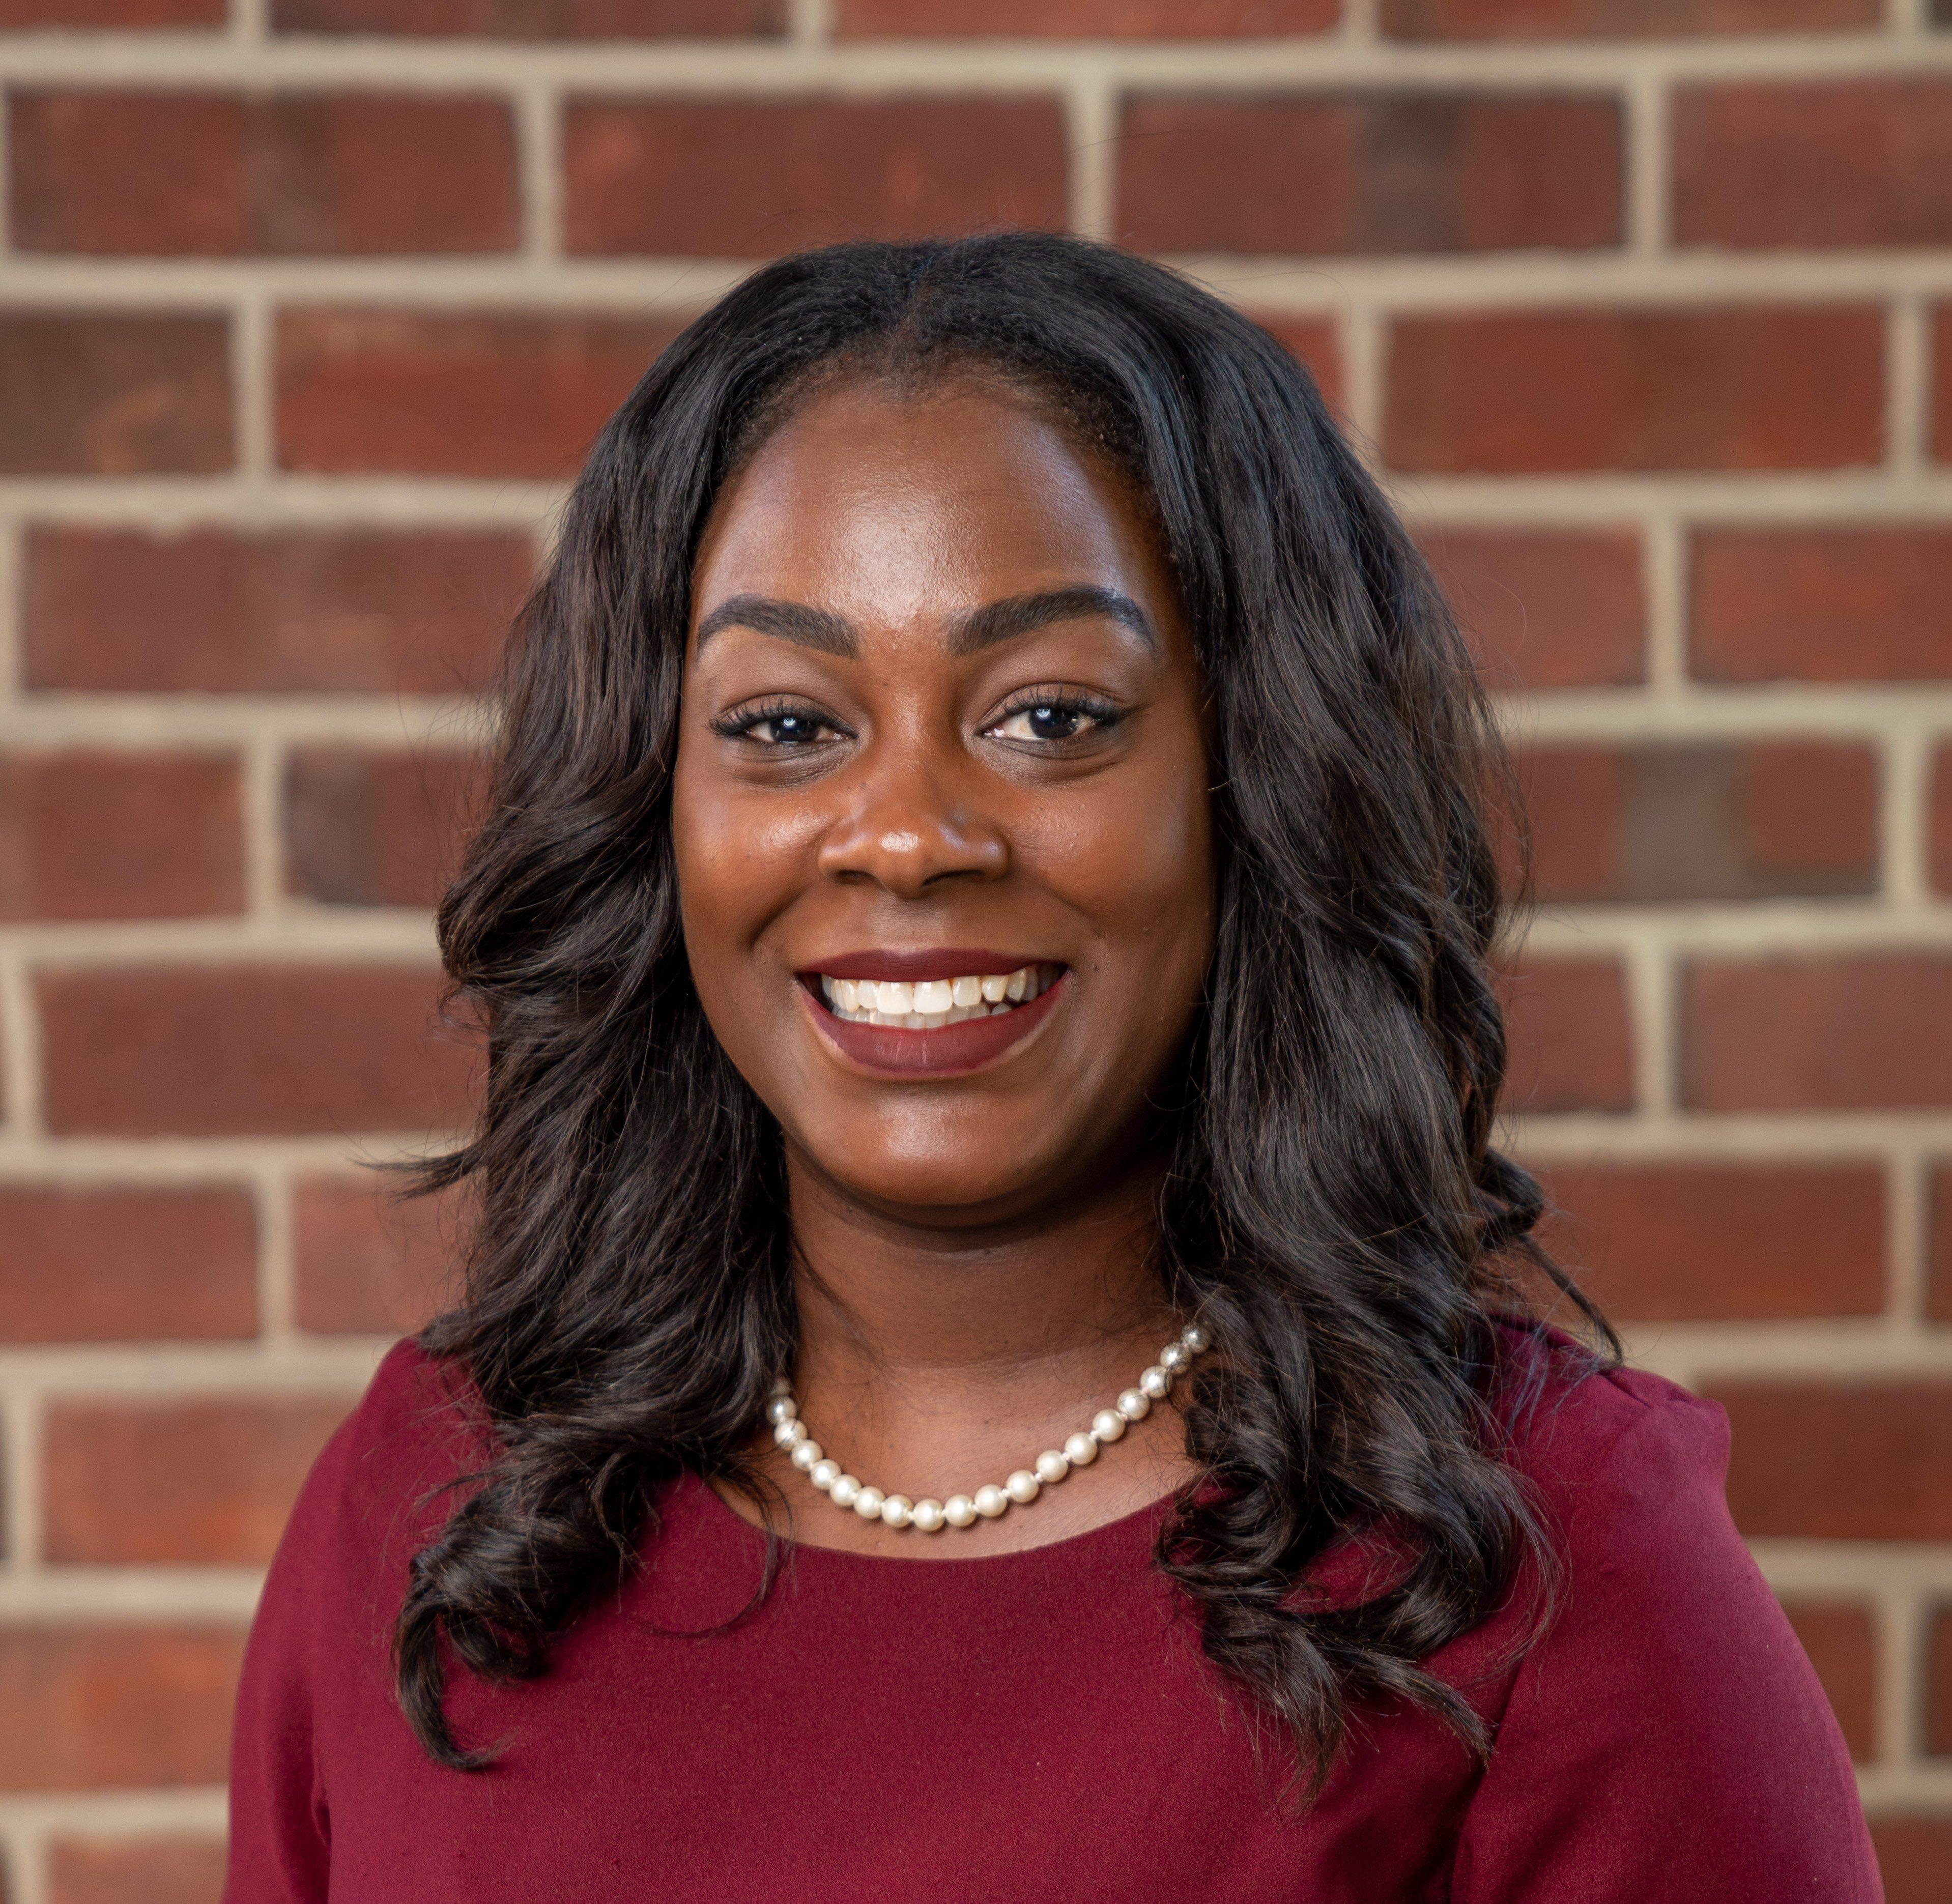 Sharina Porter